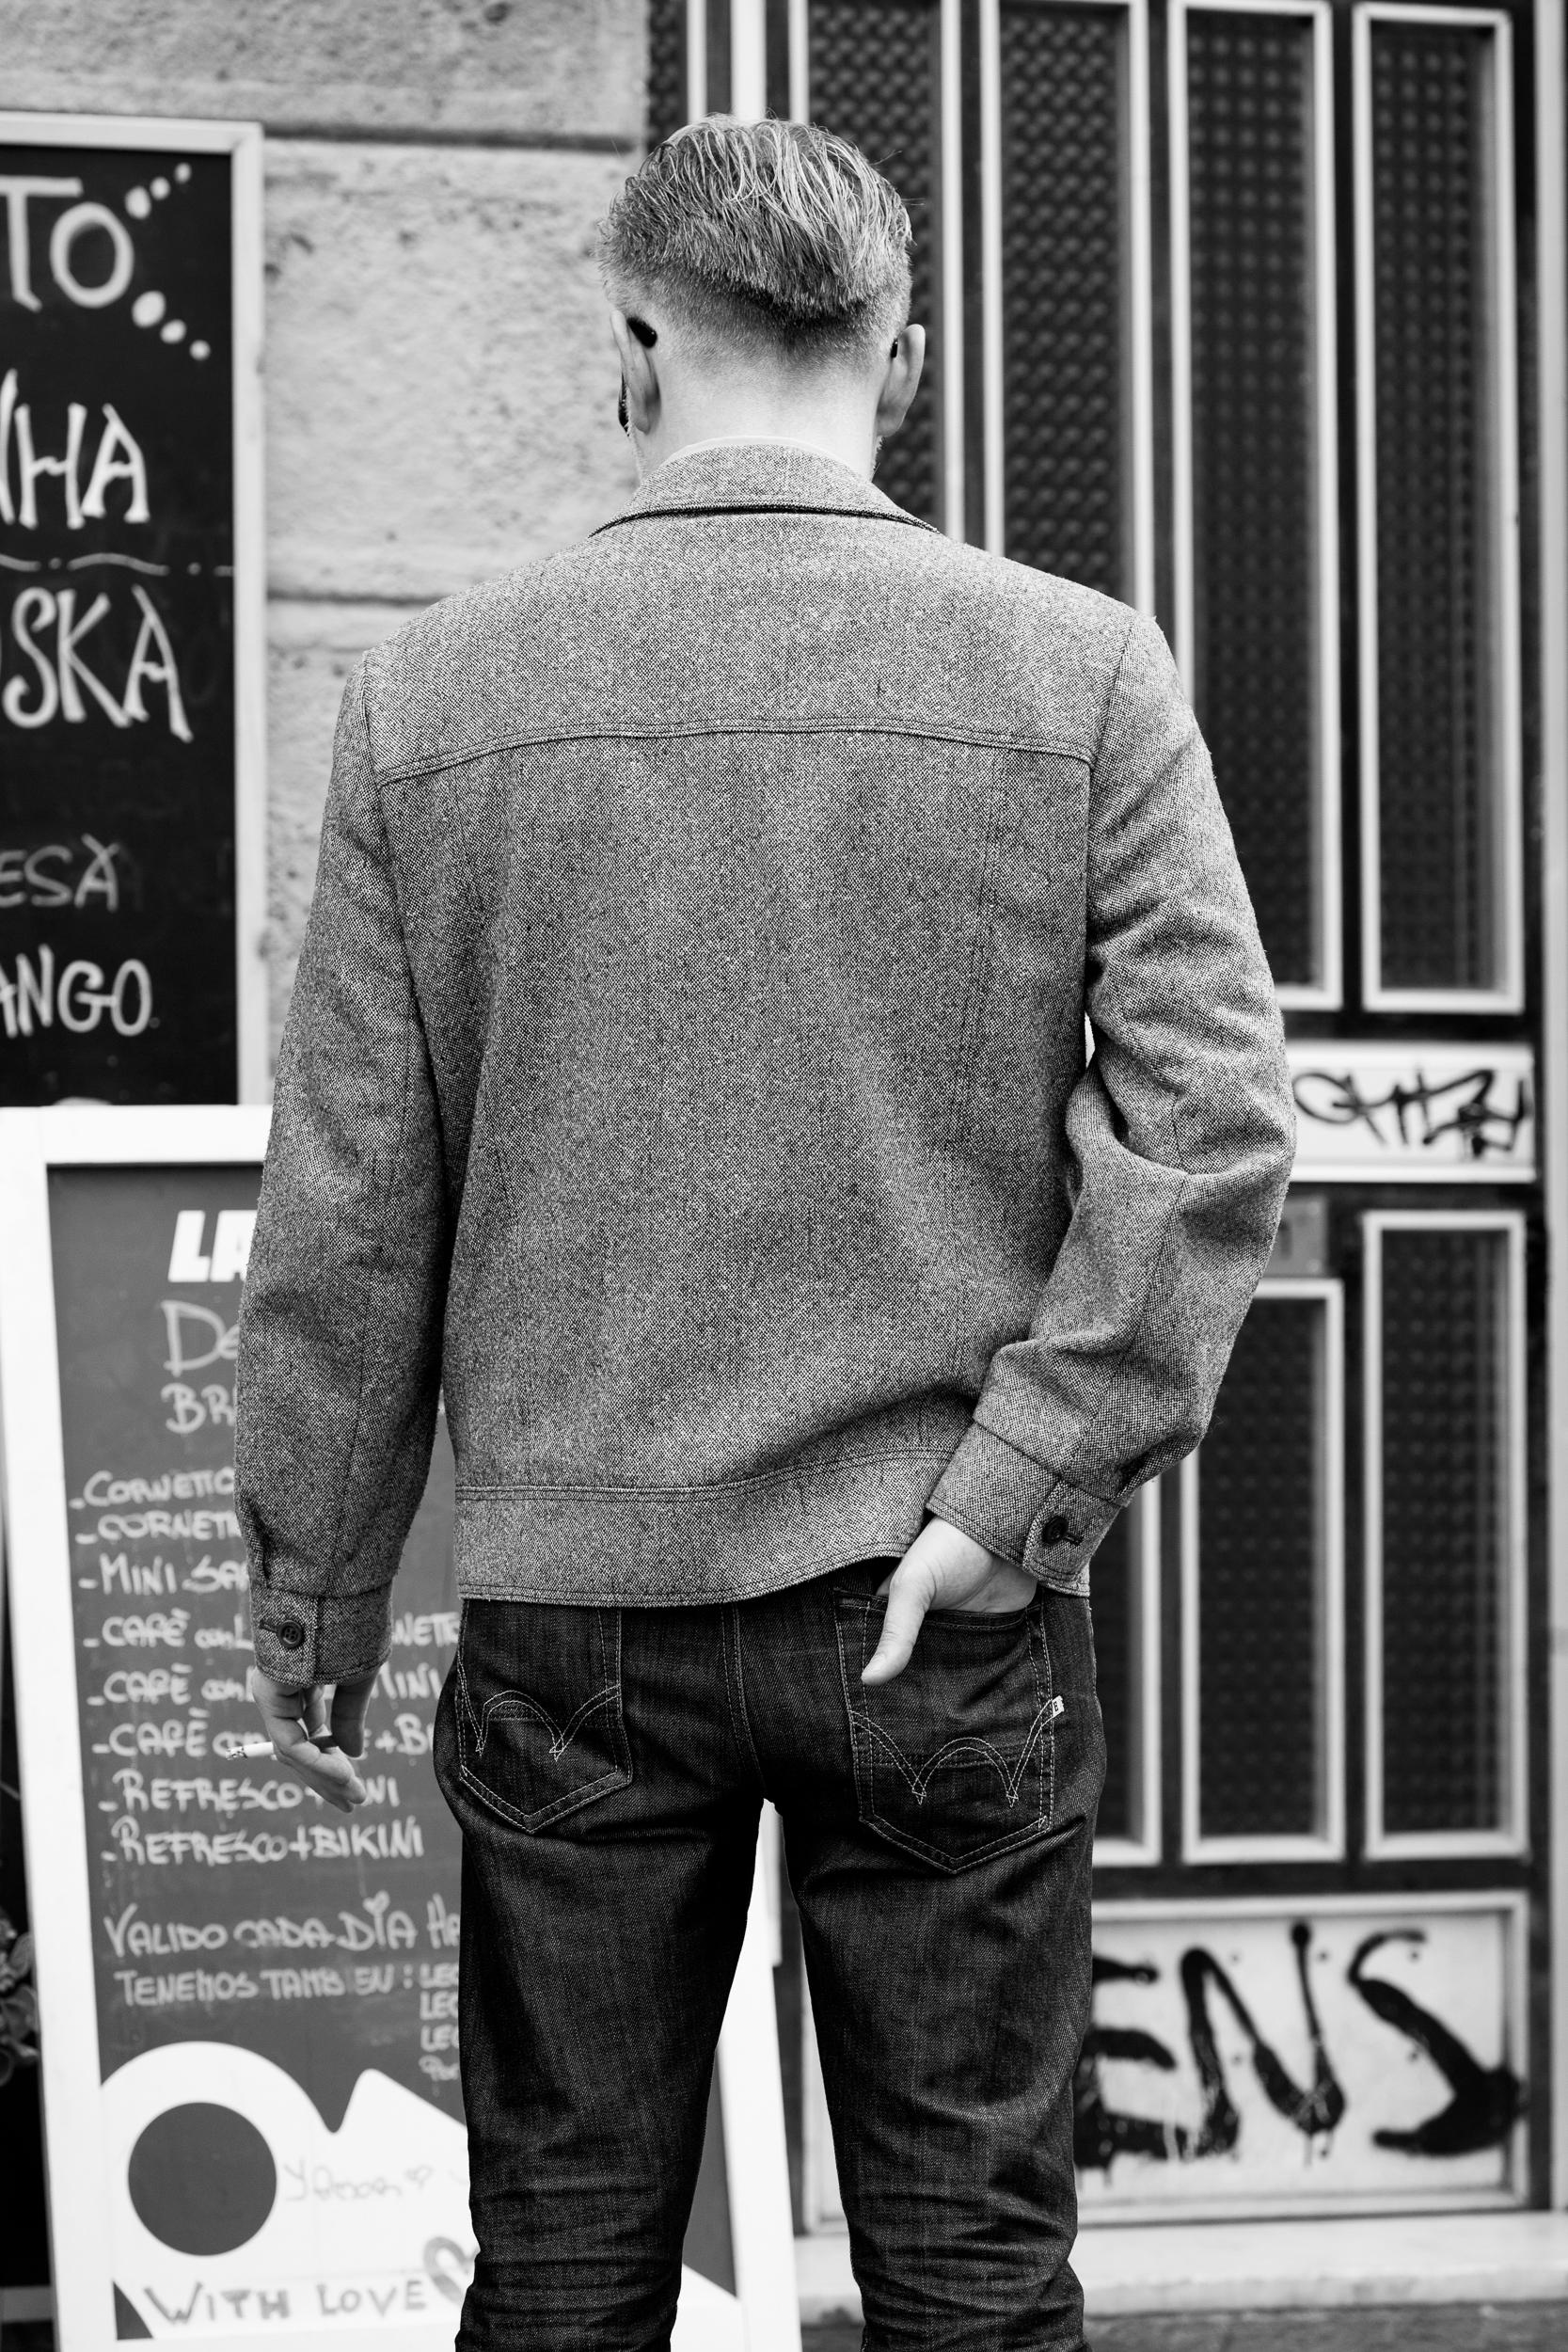 Chacon Images_Barcelona_Street_WEB_-3298.jpg